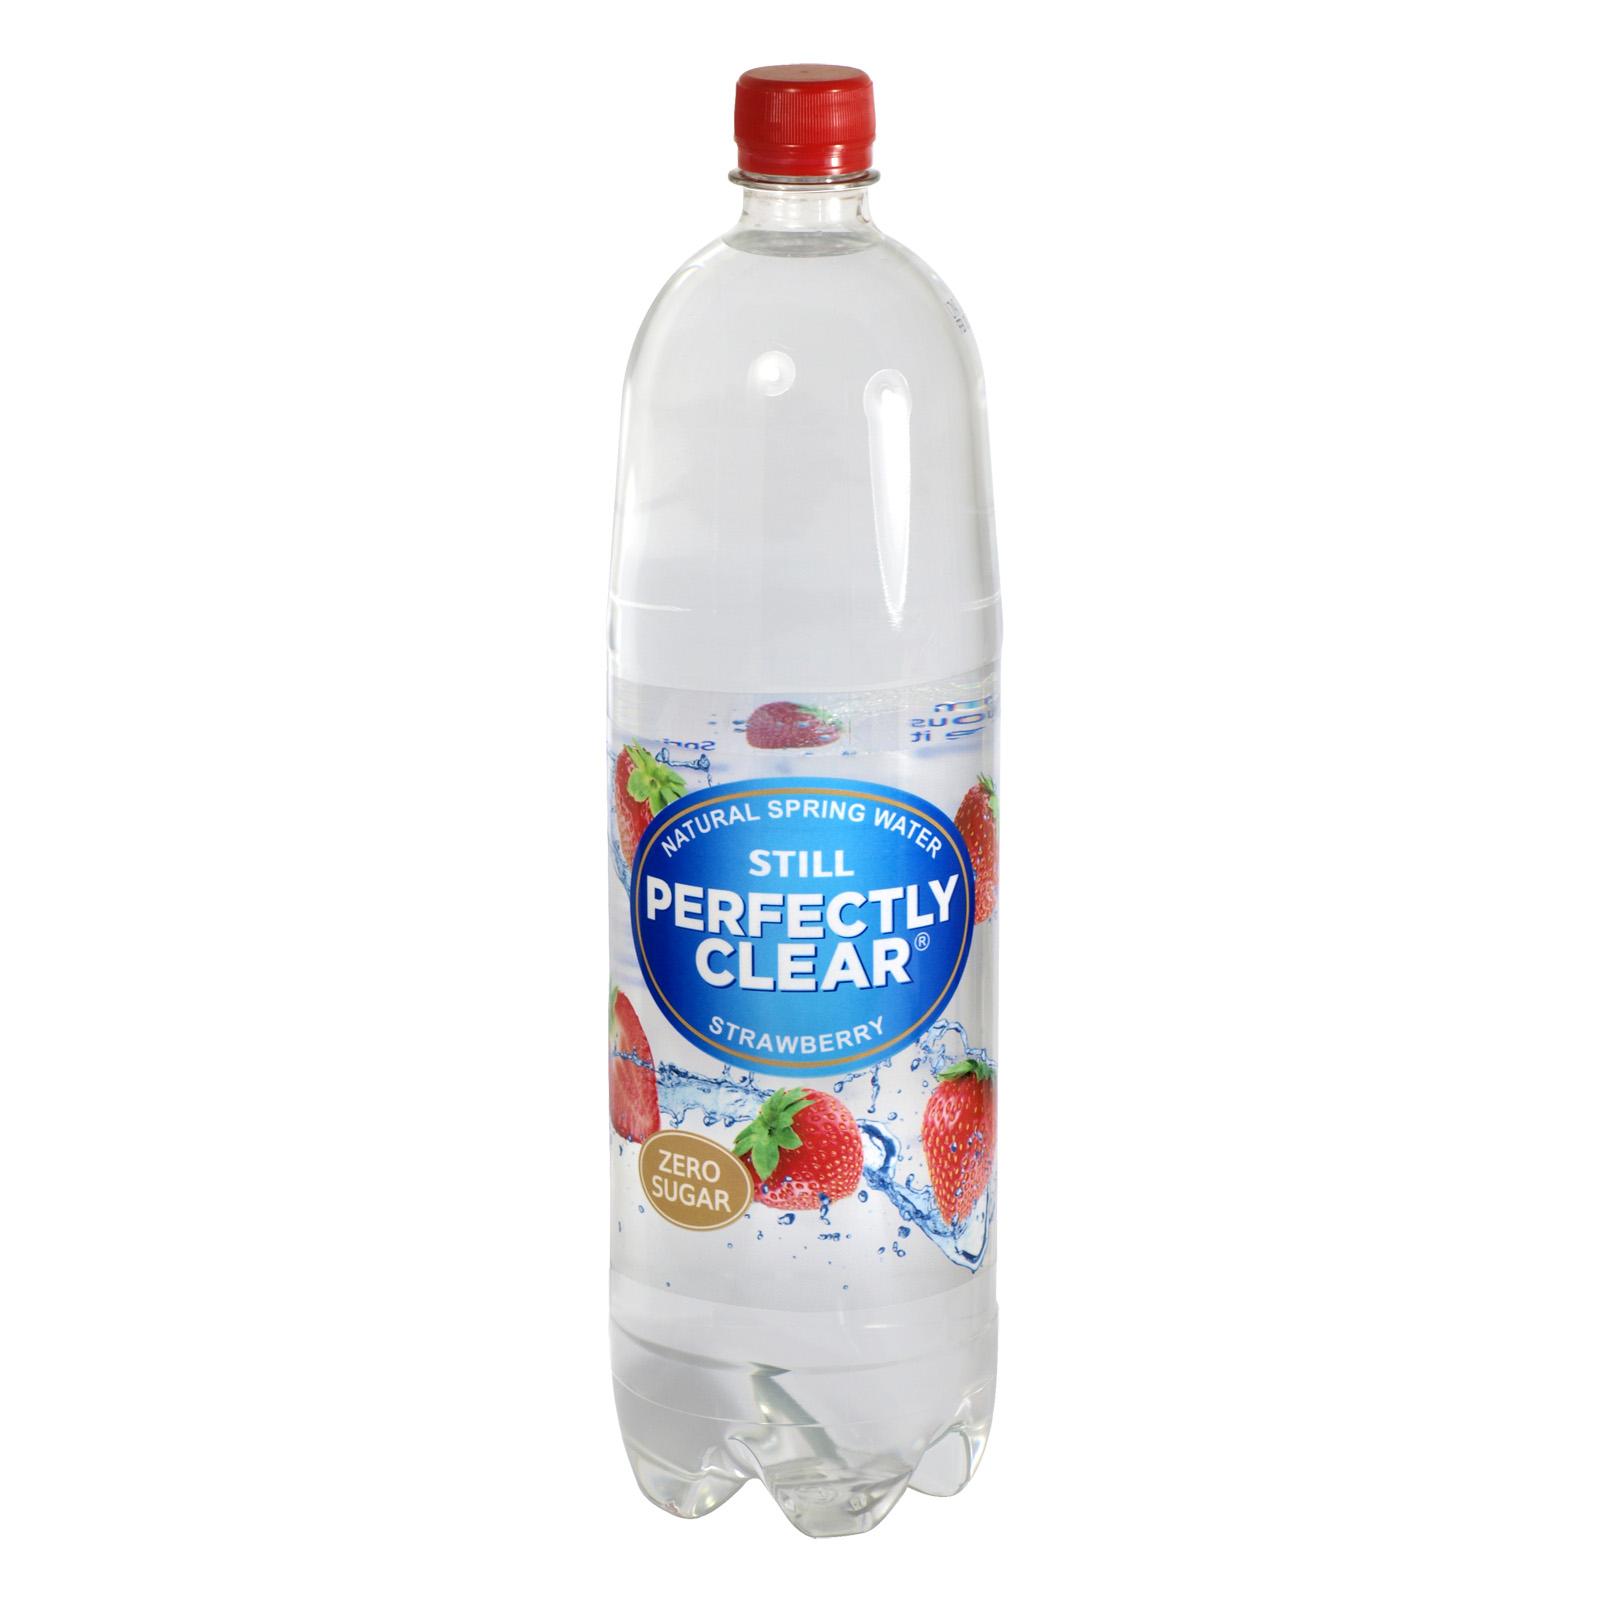 PERFECTLY CLEAR STILL 1.5L STRAWBERRY X8